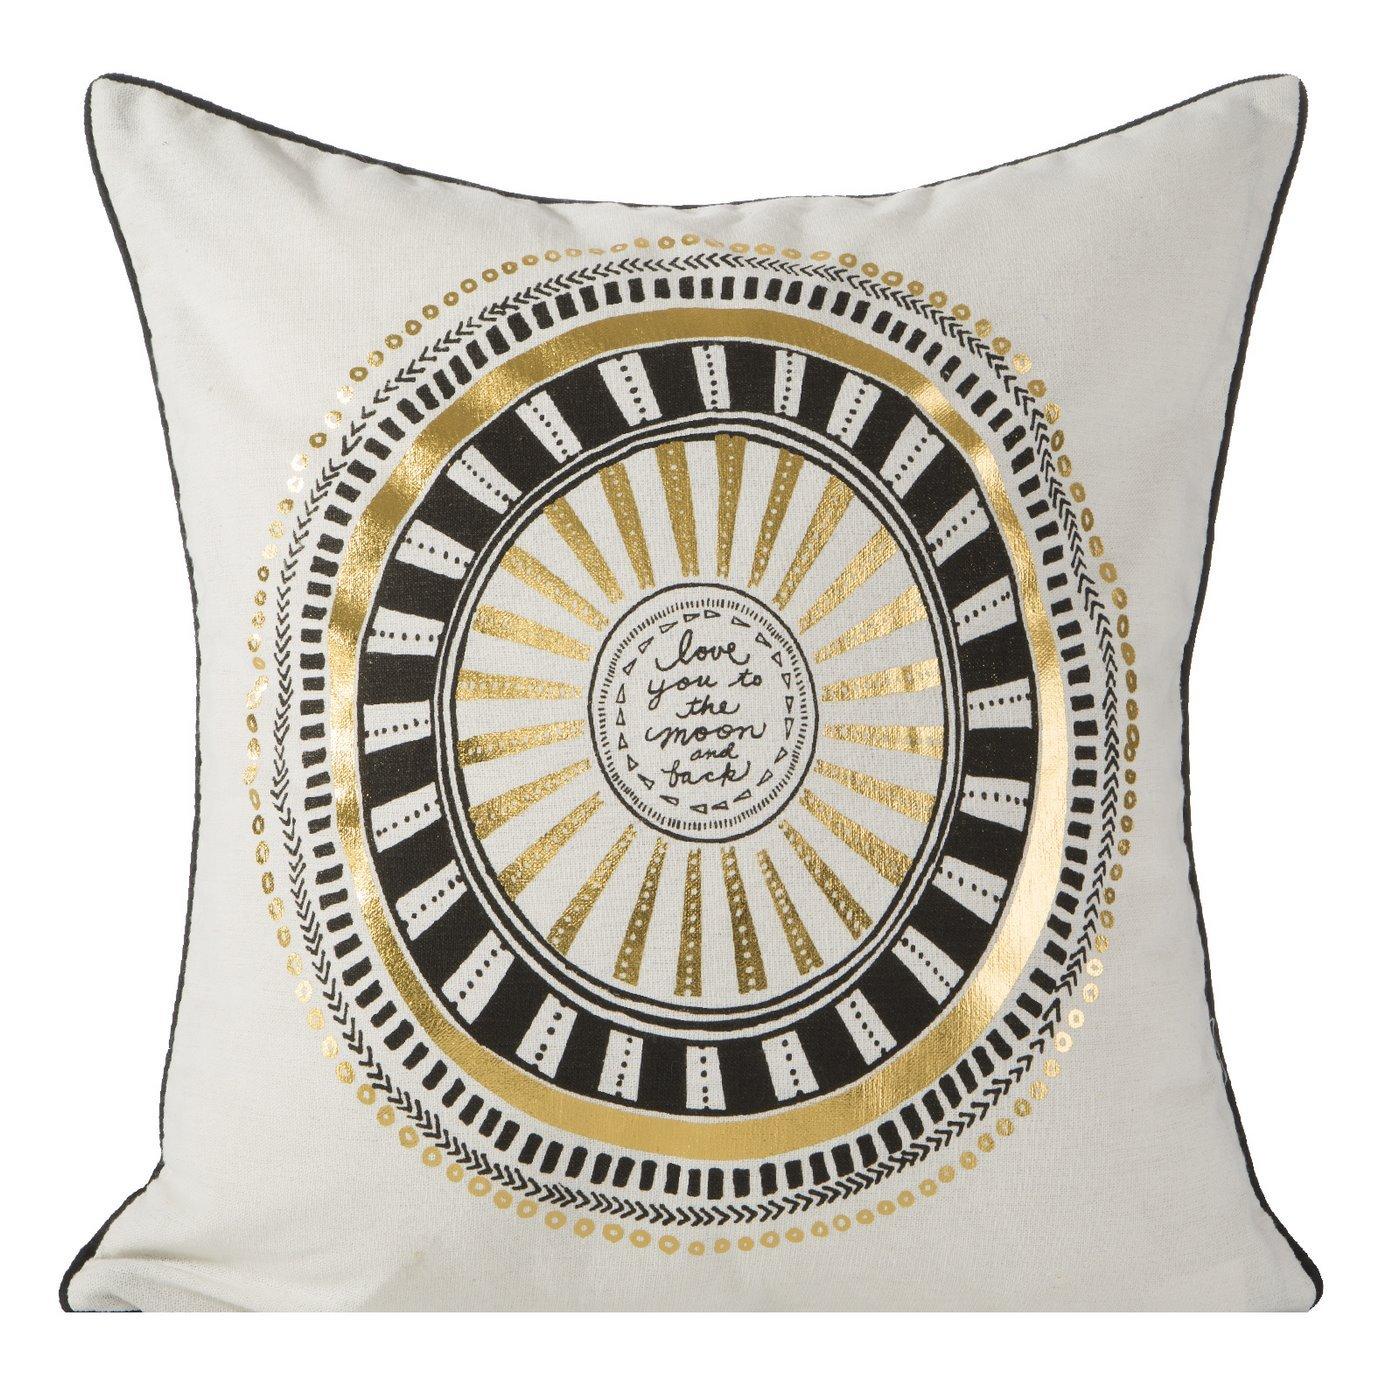 Poszewka dekoracyjna na poduszkę 45 x 45 kolor